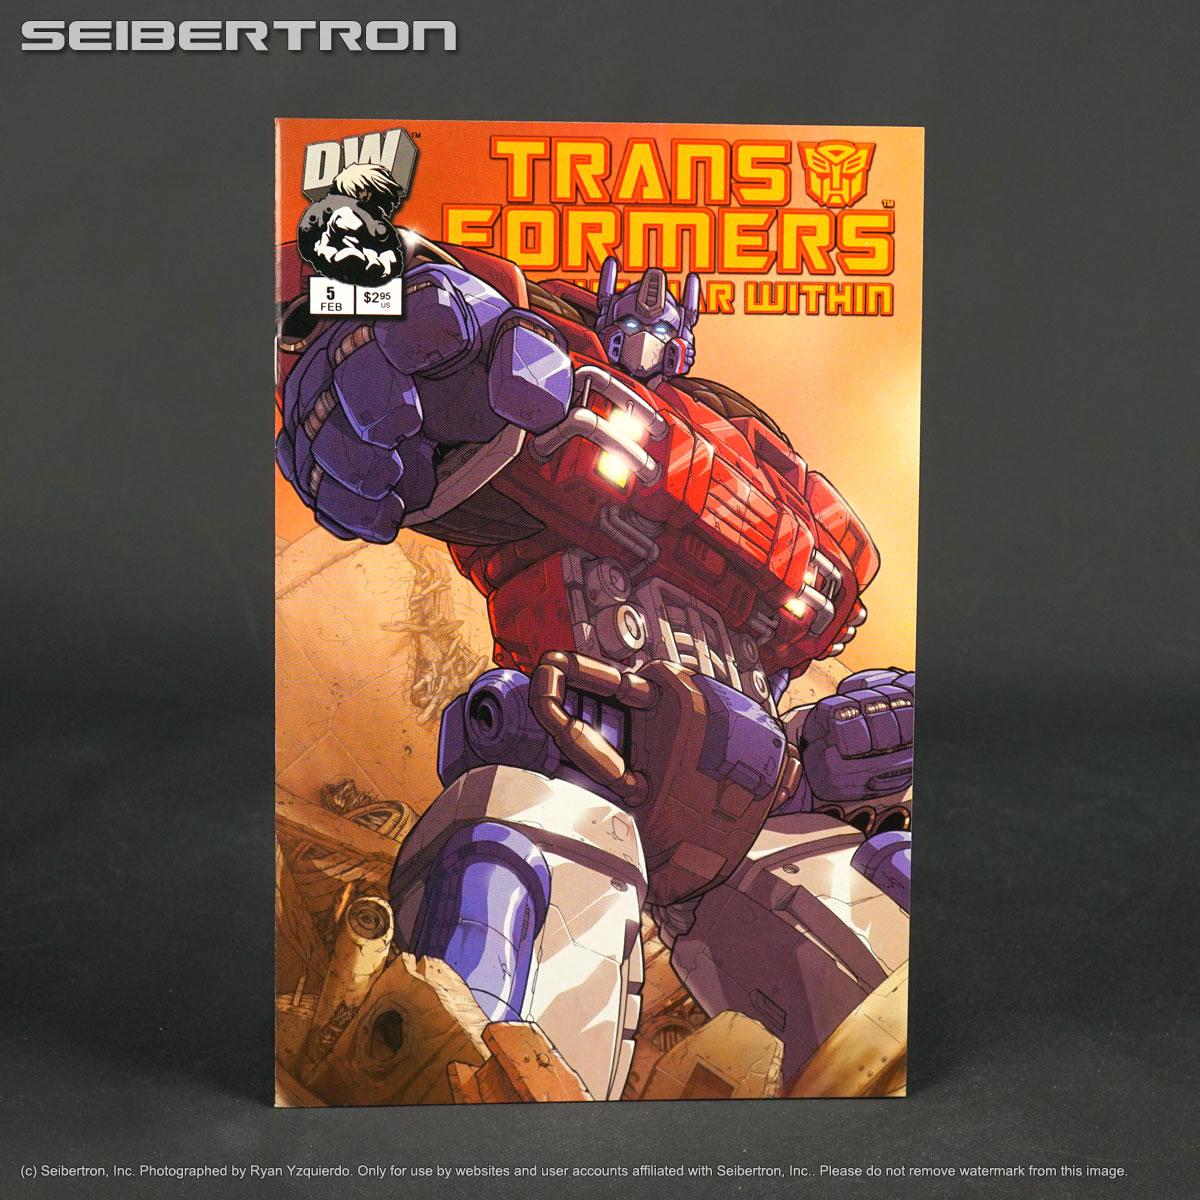 TRANSFORMERS WAR WITHIN VOLUME 2 #2 DREAMWAVE COMICS